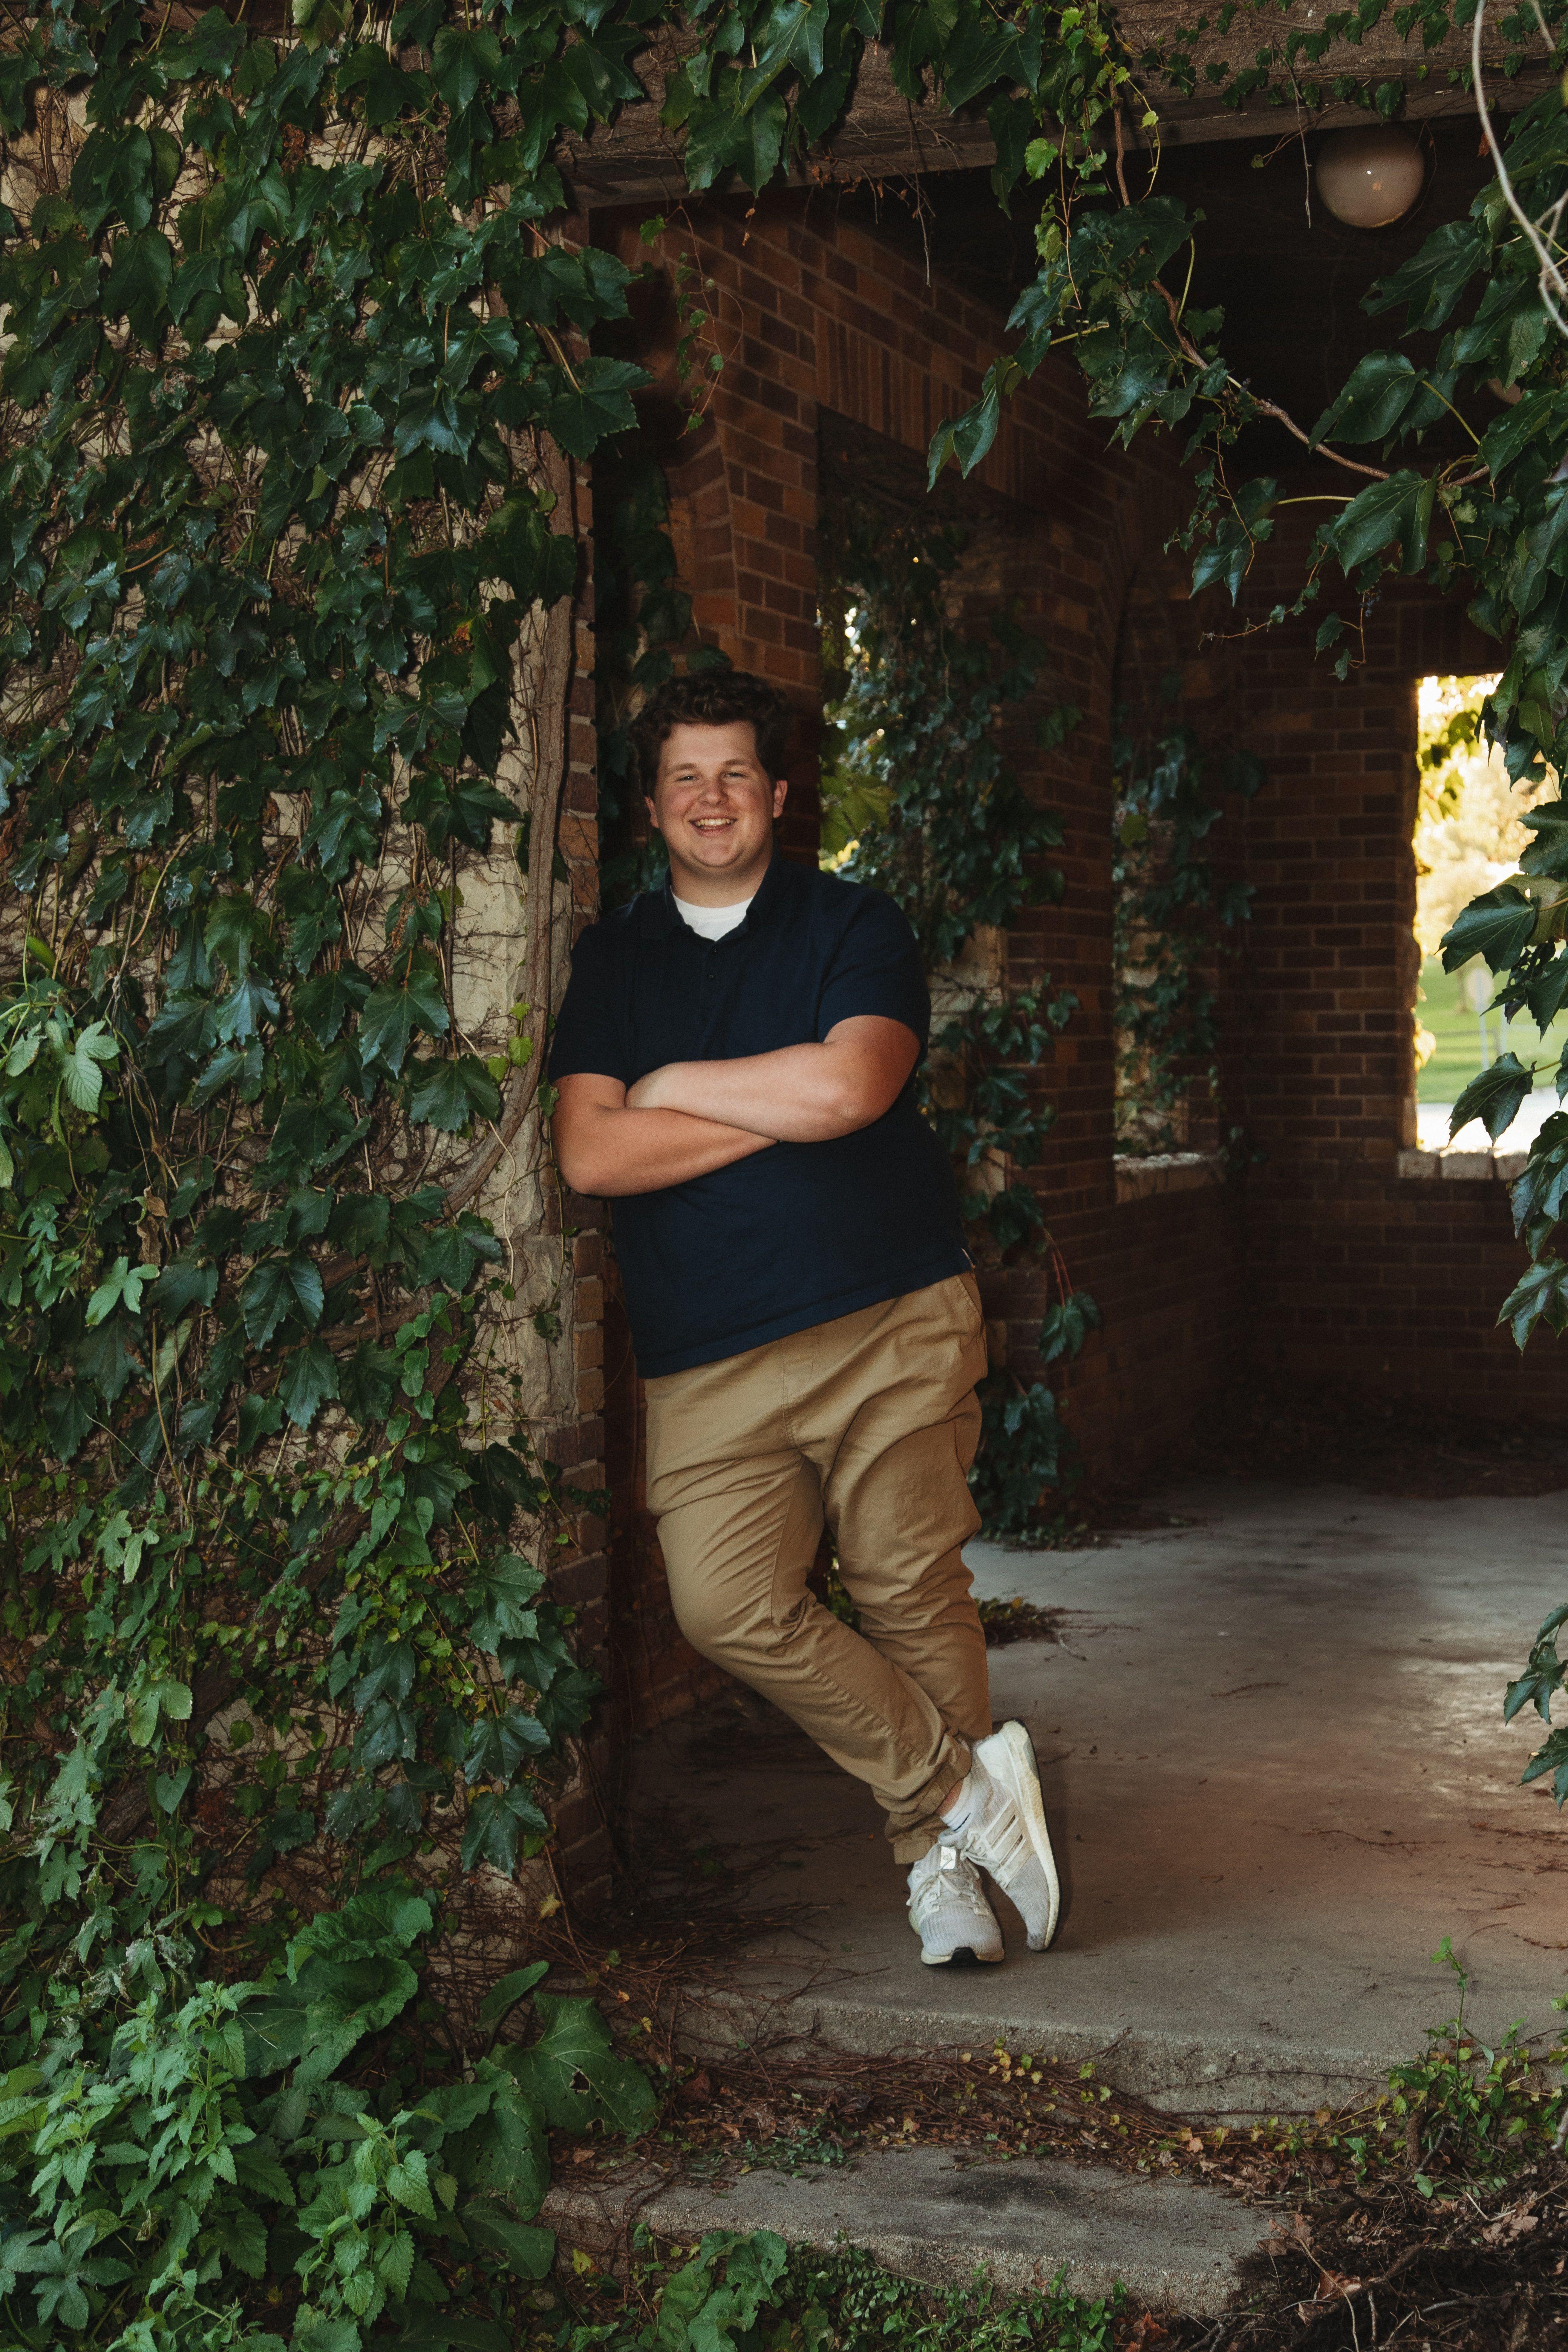 Class of 2020 Senior Spotlight - Ryan Rolle